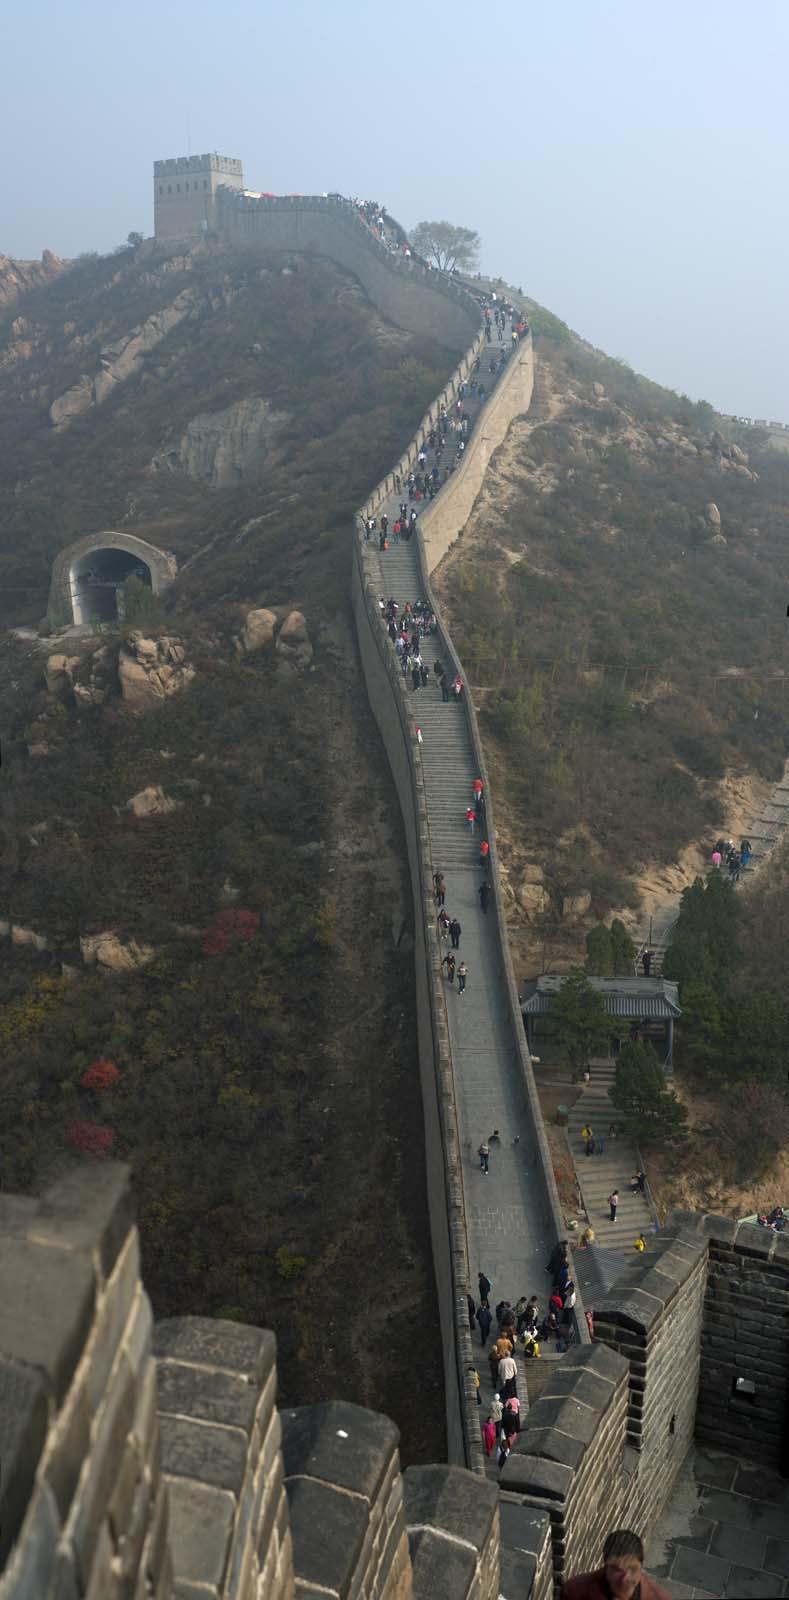 fotografia, material, livra, ajardine, imagine, proveja fotografia,Great Wall Panorama, Paredes, Castelo de Lou, Xiongnu, Imperador Guangwu de Han